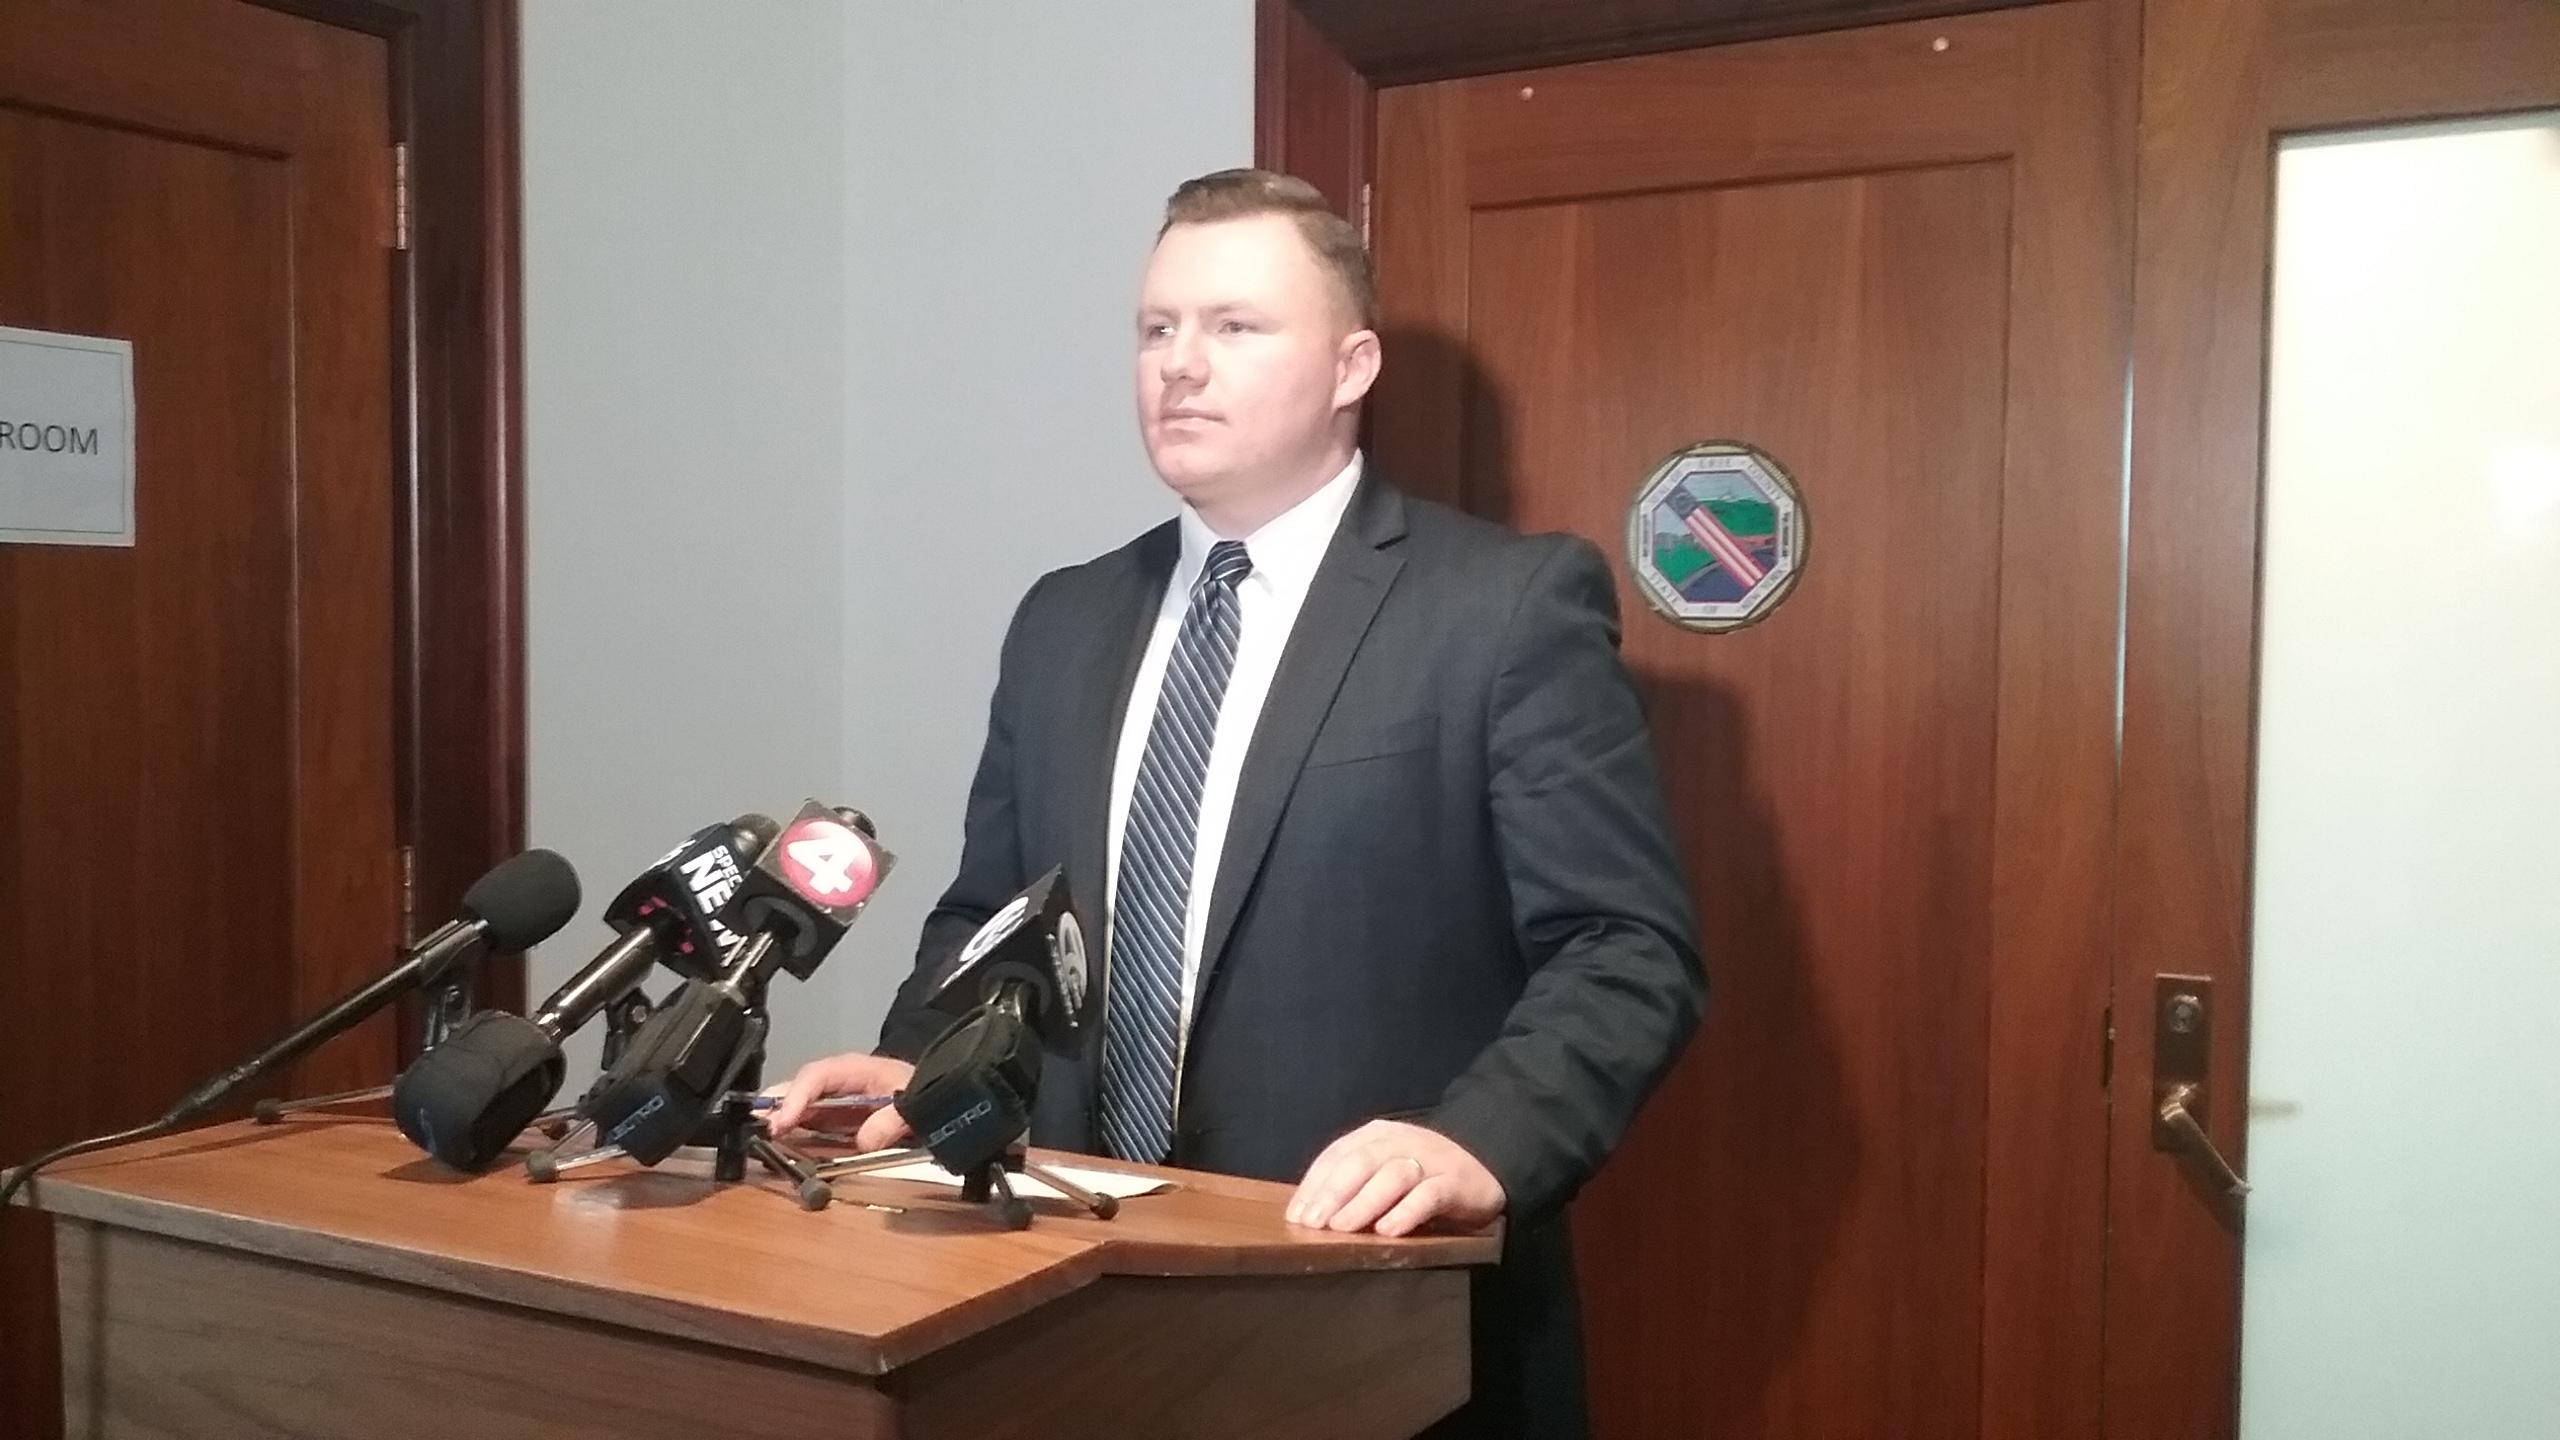 Erie County Legislator Patrick Burke, D-Buffalo, announces his desire for an additional $1 million to go toward drug treatment.